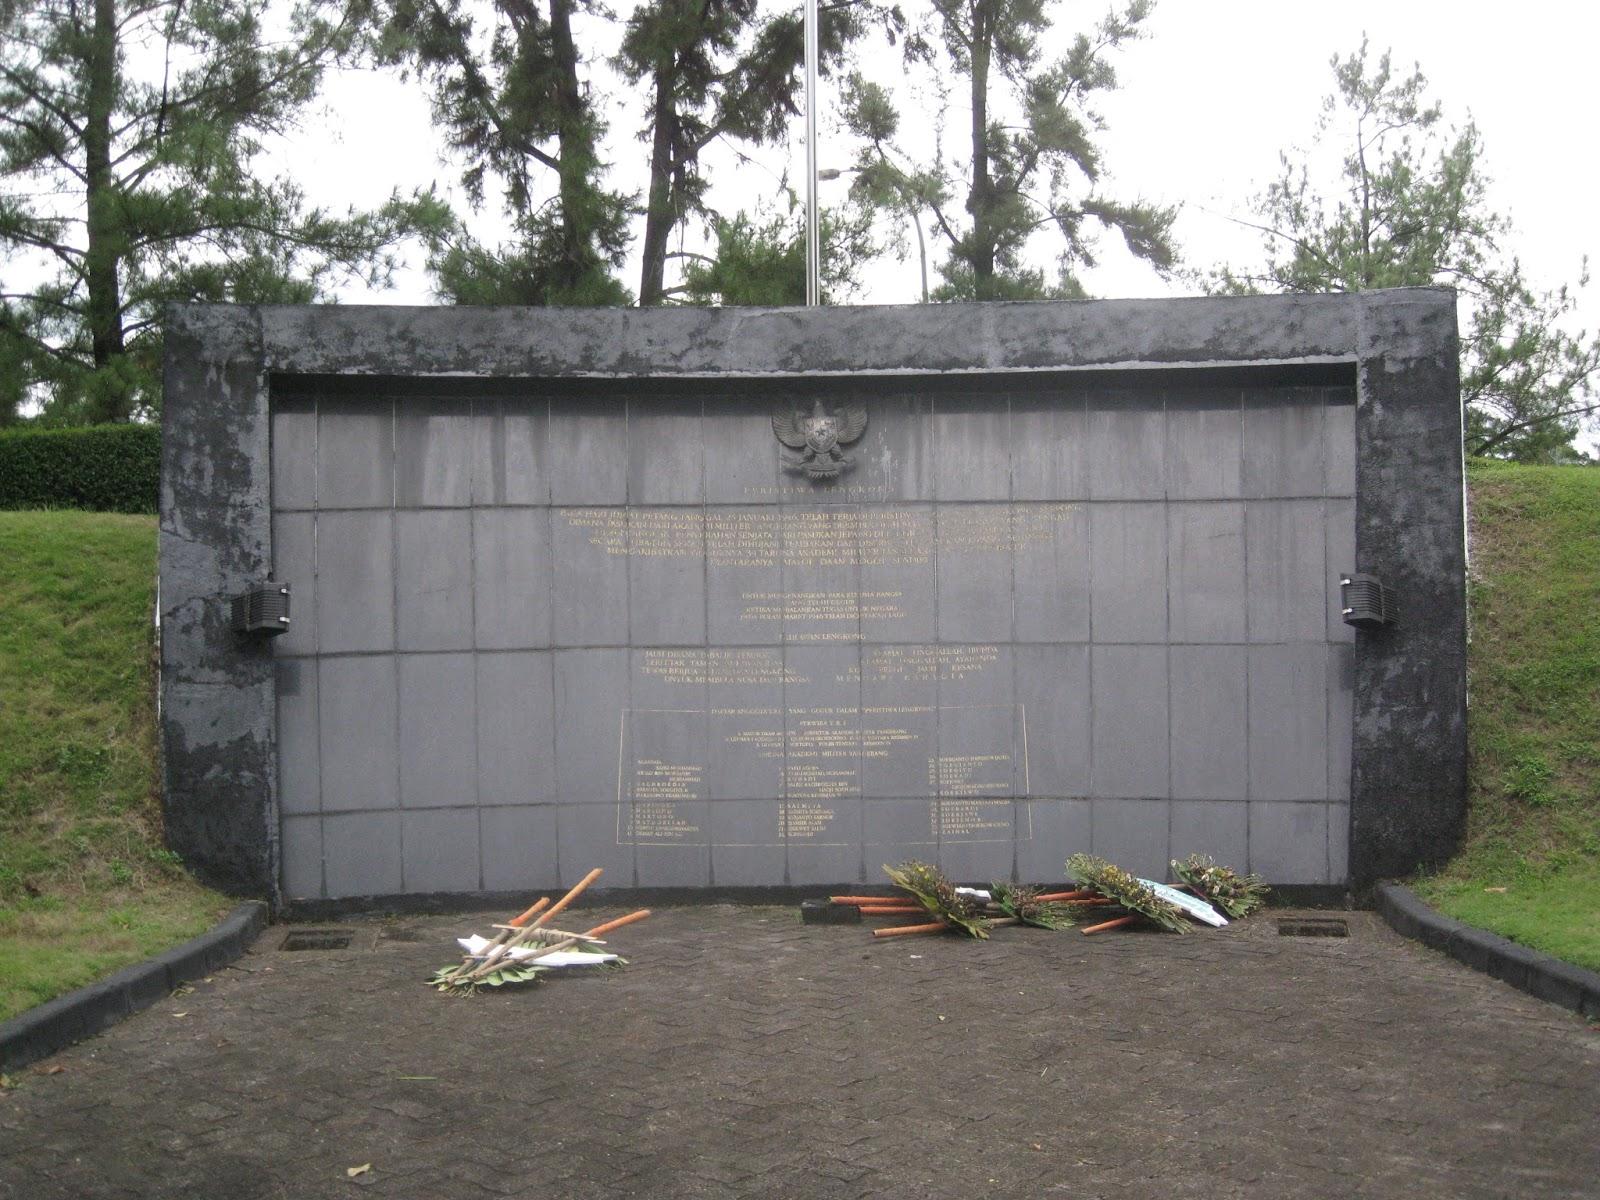 Letsgo2museum Monumen Palagan Lengkong Serpong Peristiwa Sebagian Traveler Mungkin Tidak